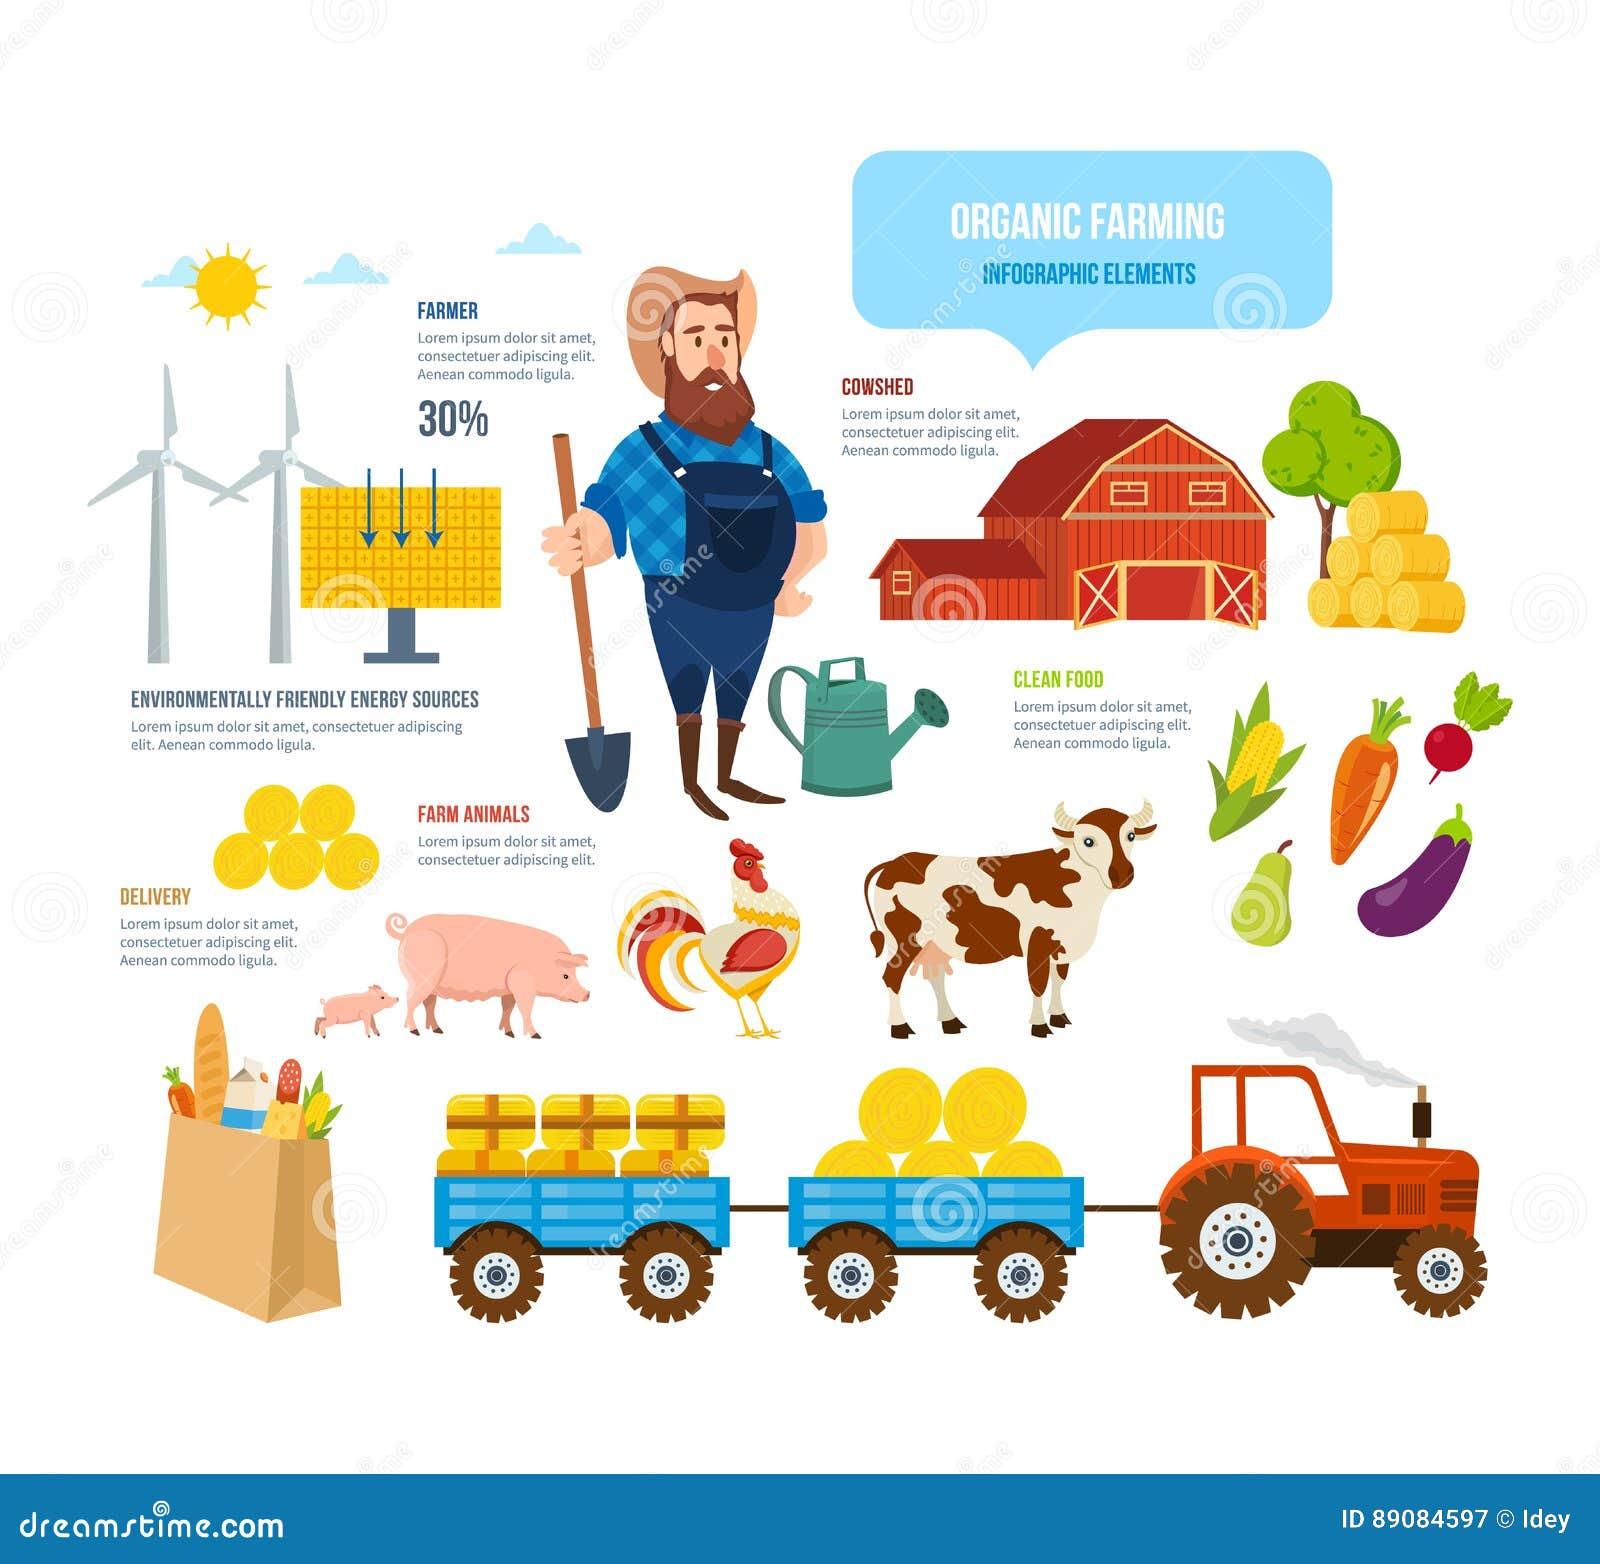 Fazendeiro, animais, alimento limpo natural, fontes de energia a favor do meio ambiente, entrega